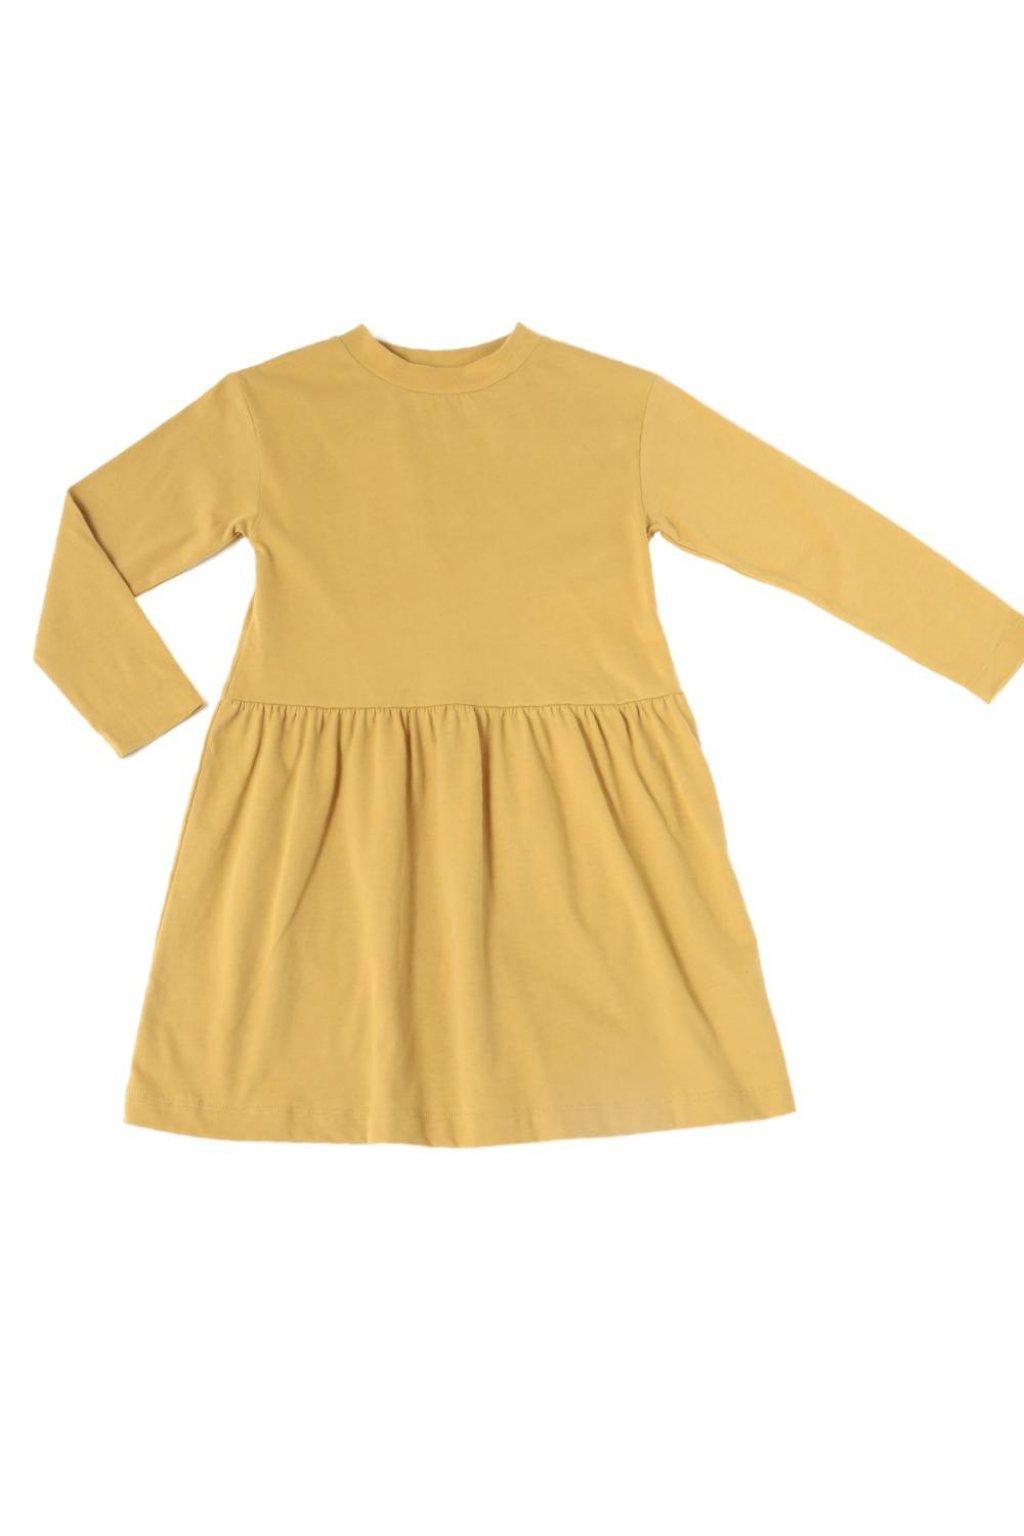 SPINN-AROUND DRESS - HONEY GOLD